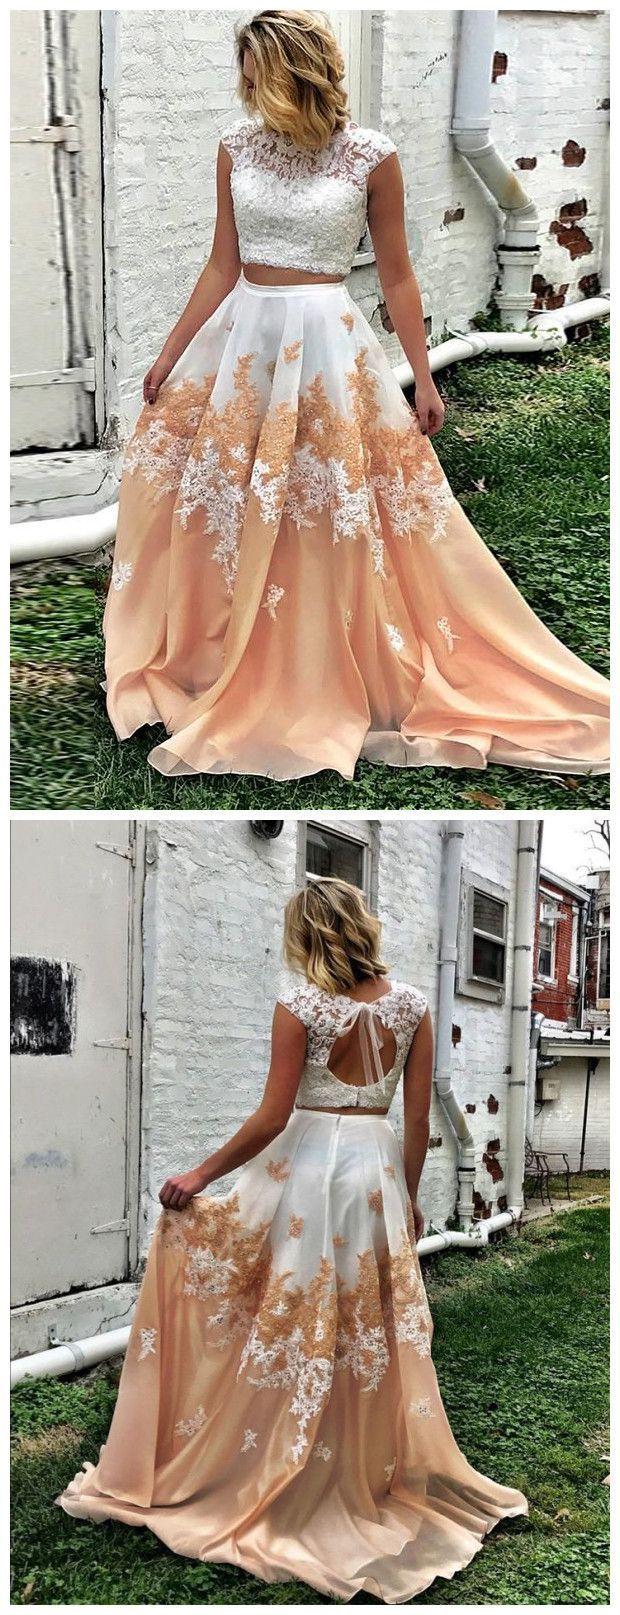 Prom dresses gorgeous prom dressesprom dresses uniqueprom